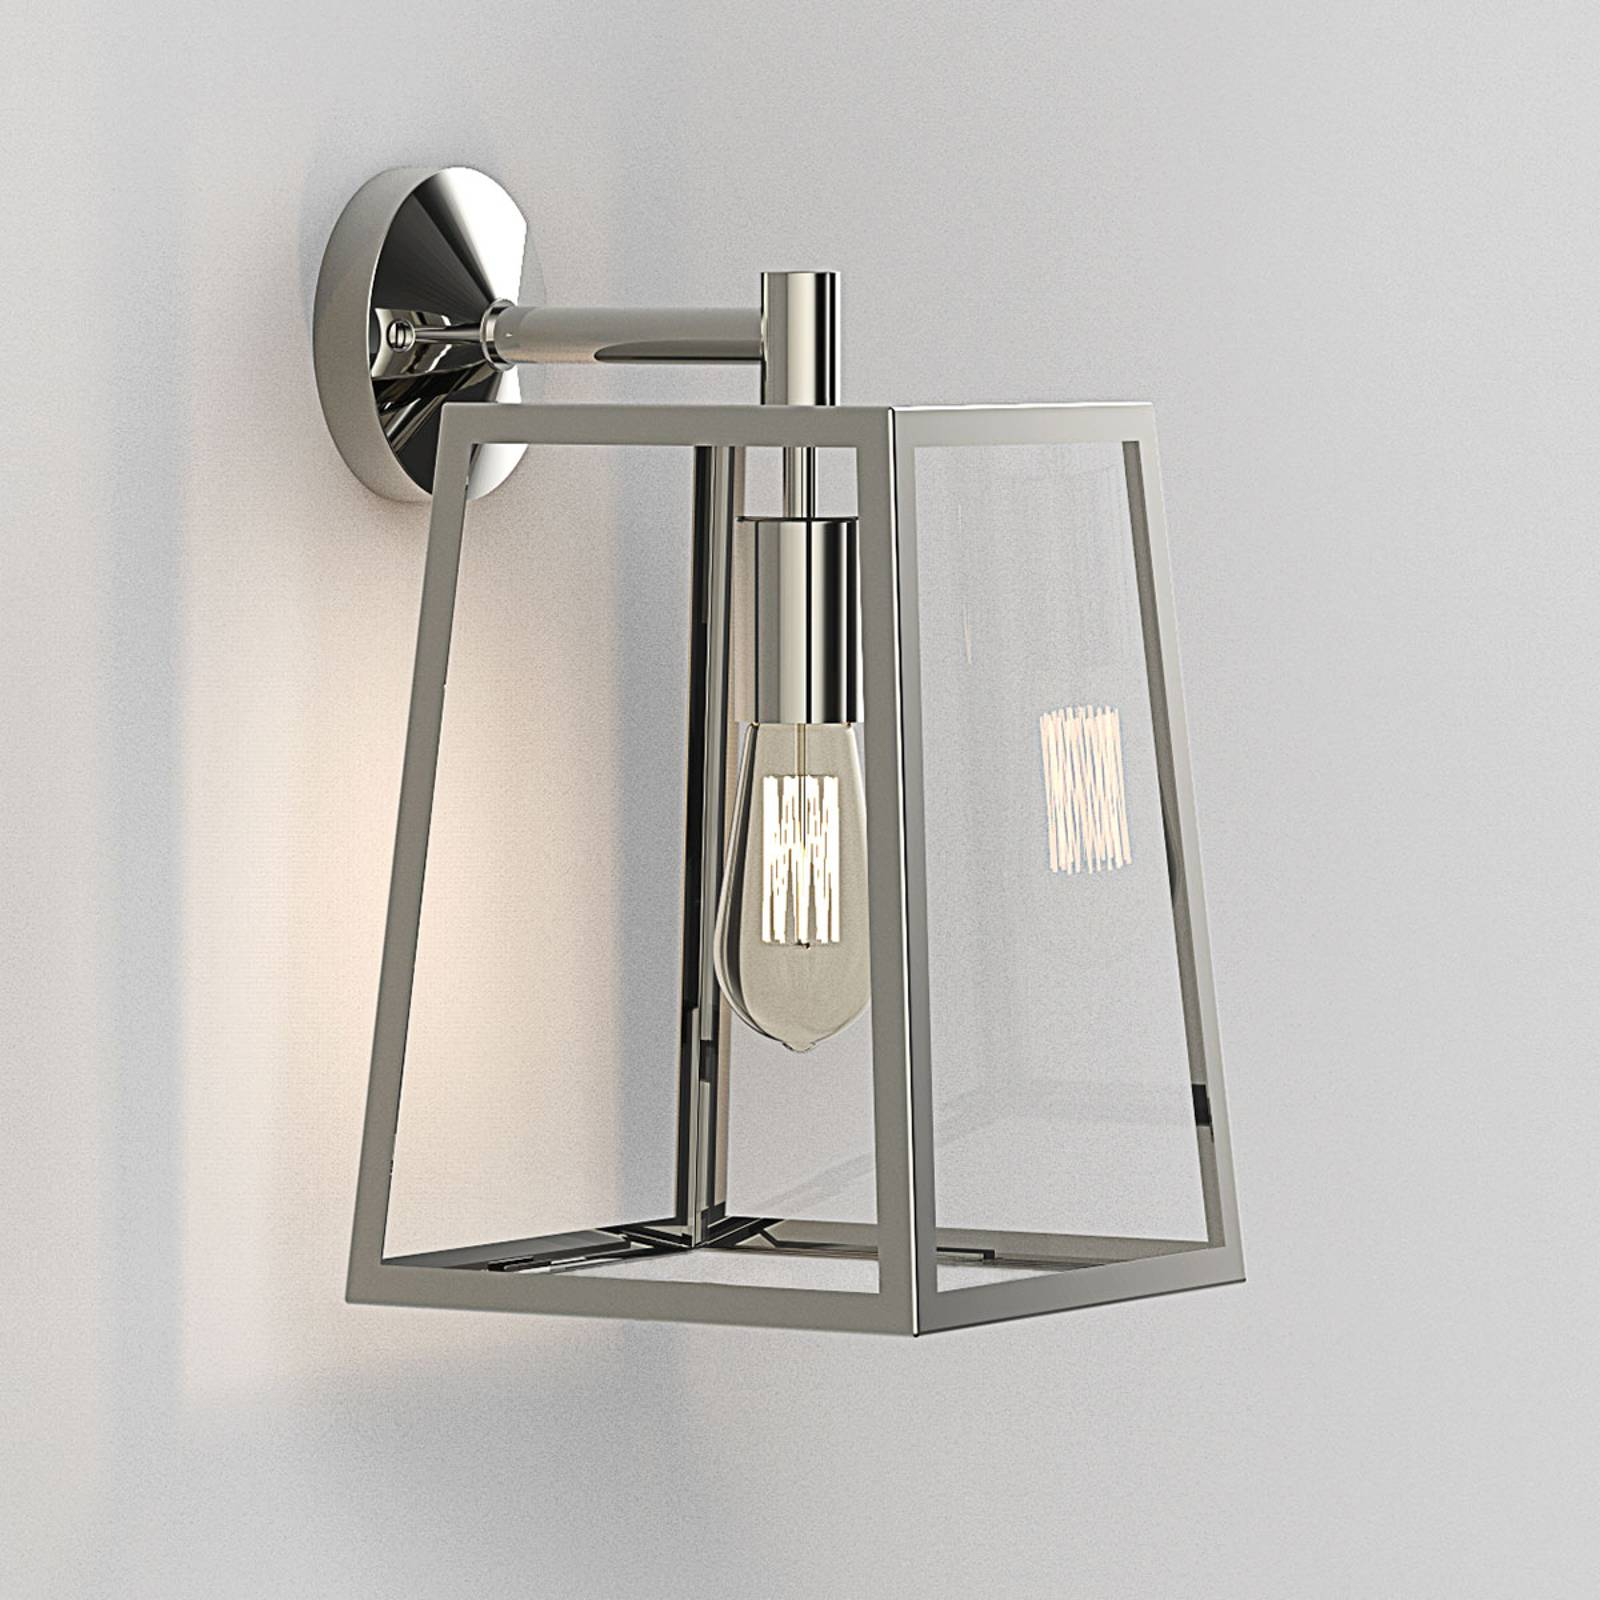 Astro Calvi - buitenwandlamp, 38,5 cm, nikkel